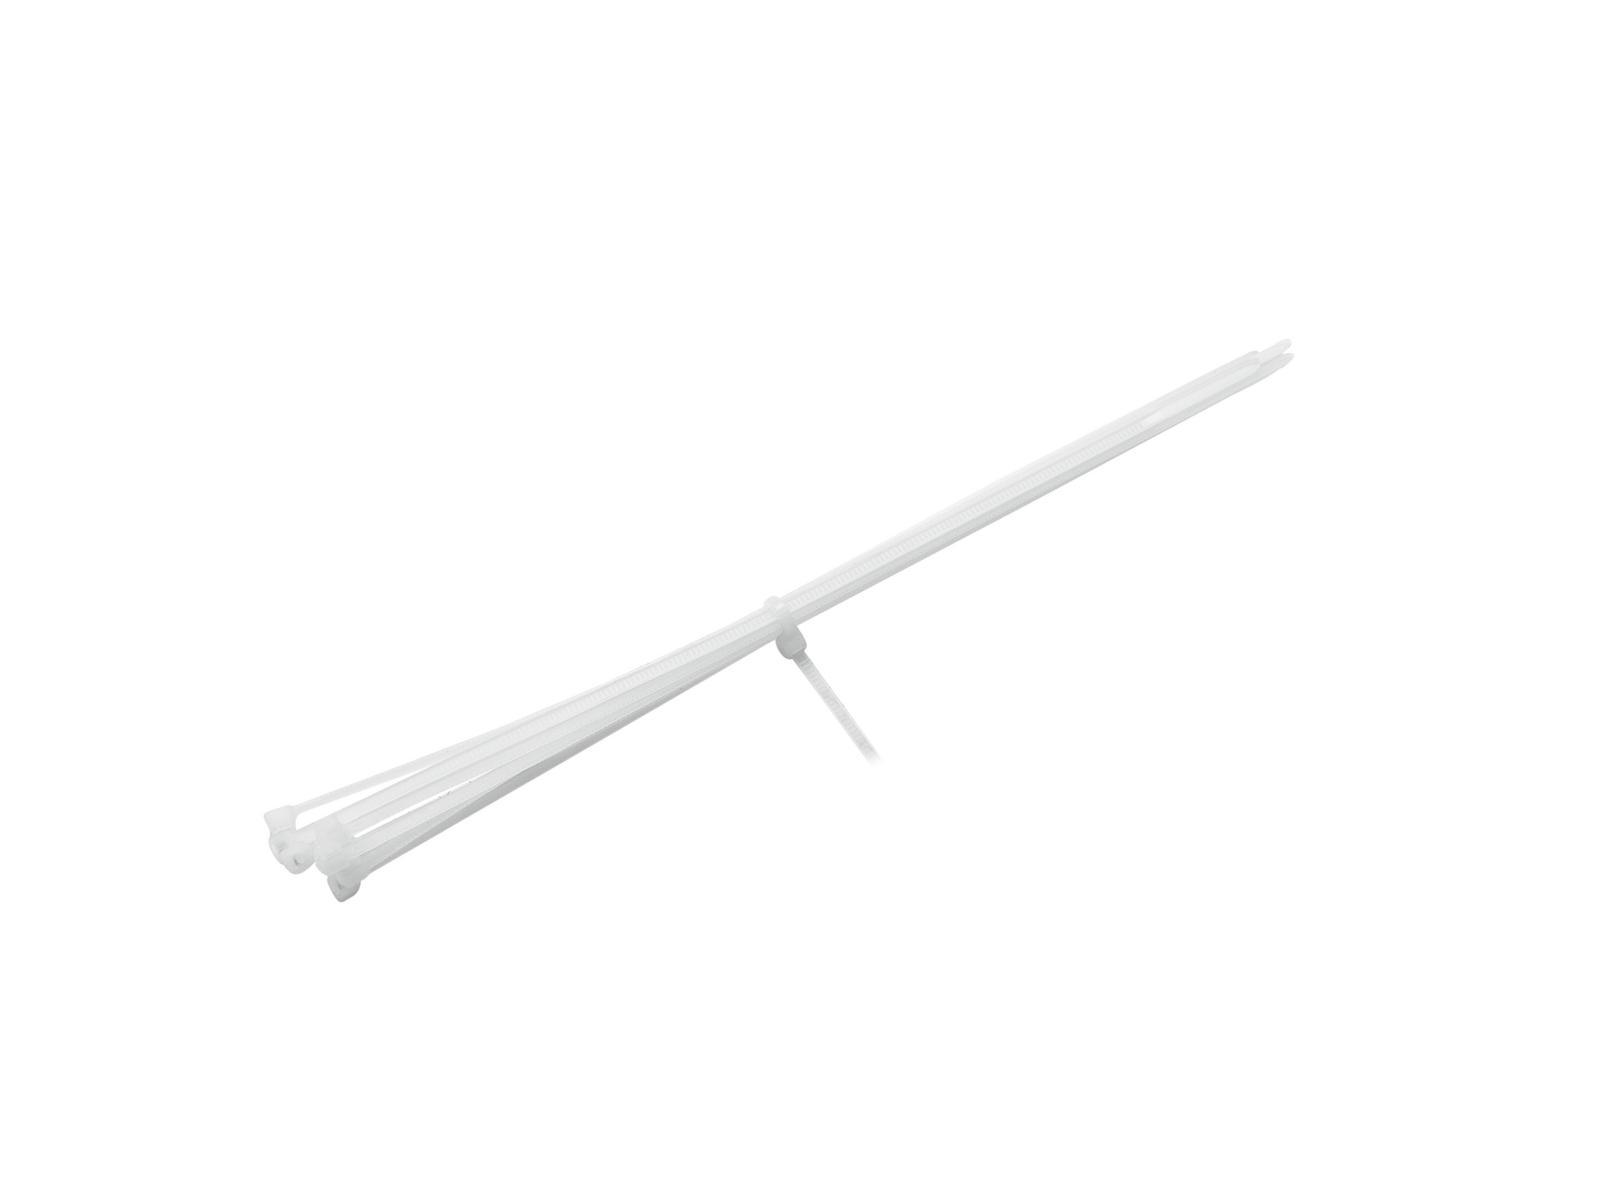 EUROLITE Cavo cravatta 350x4.5mm bianco 100x